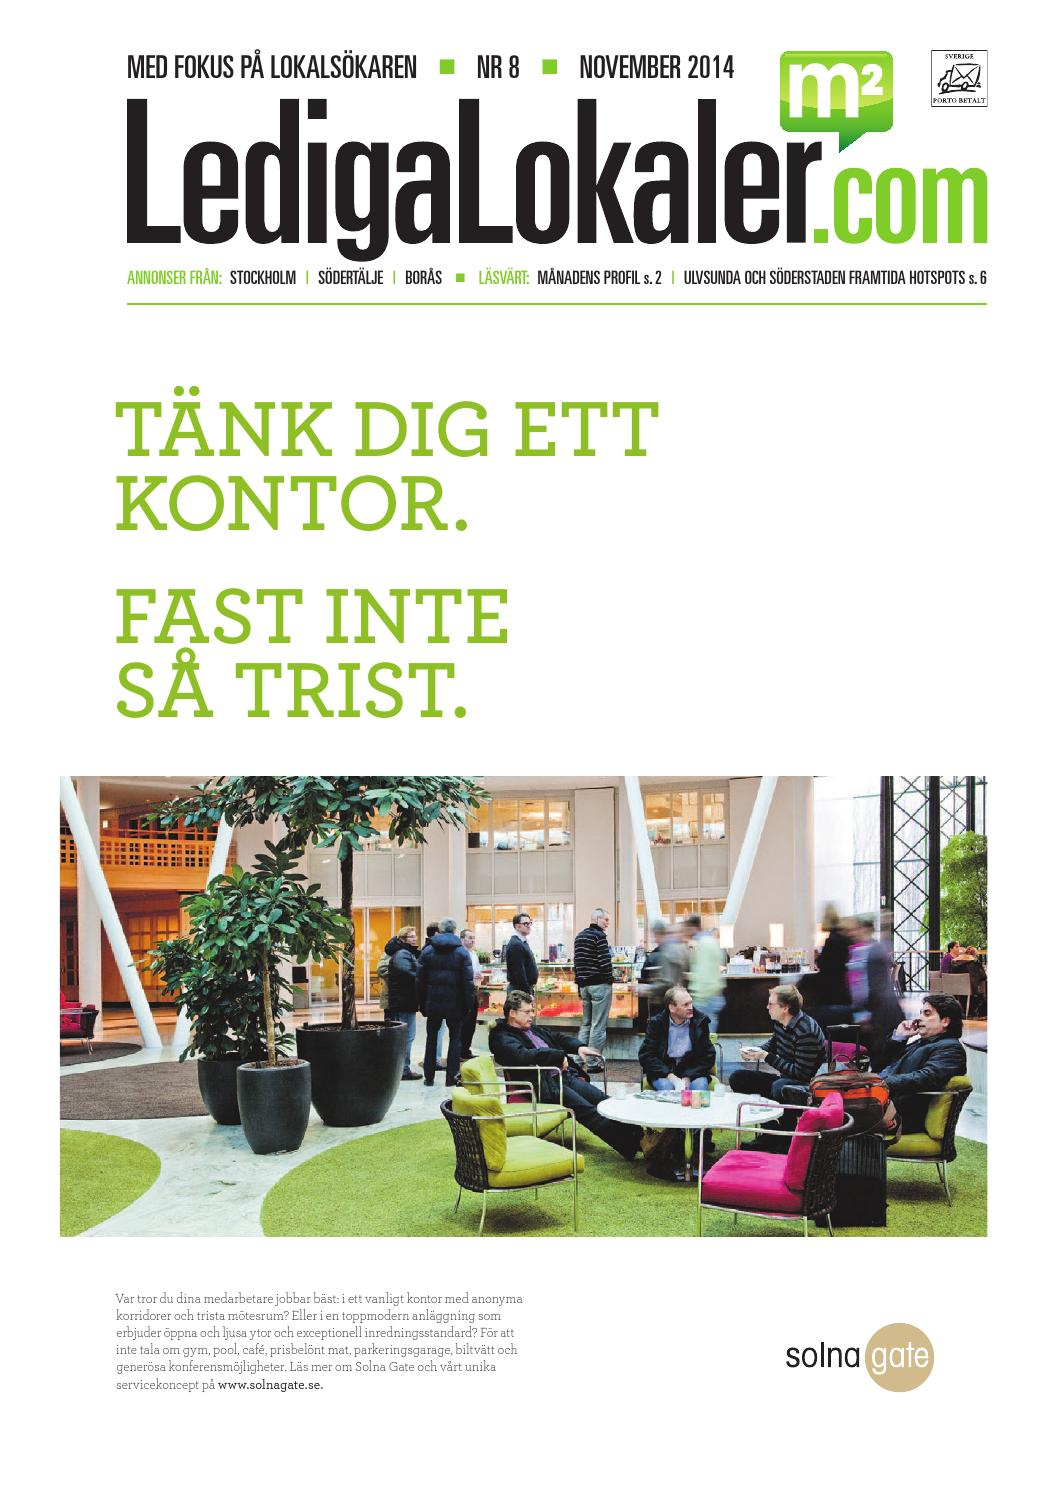 9fc4767208b Lediga Lokaler 8/2014 by LedigaLokaler.com - issuu